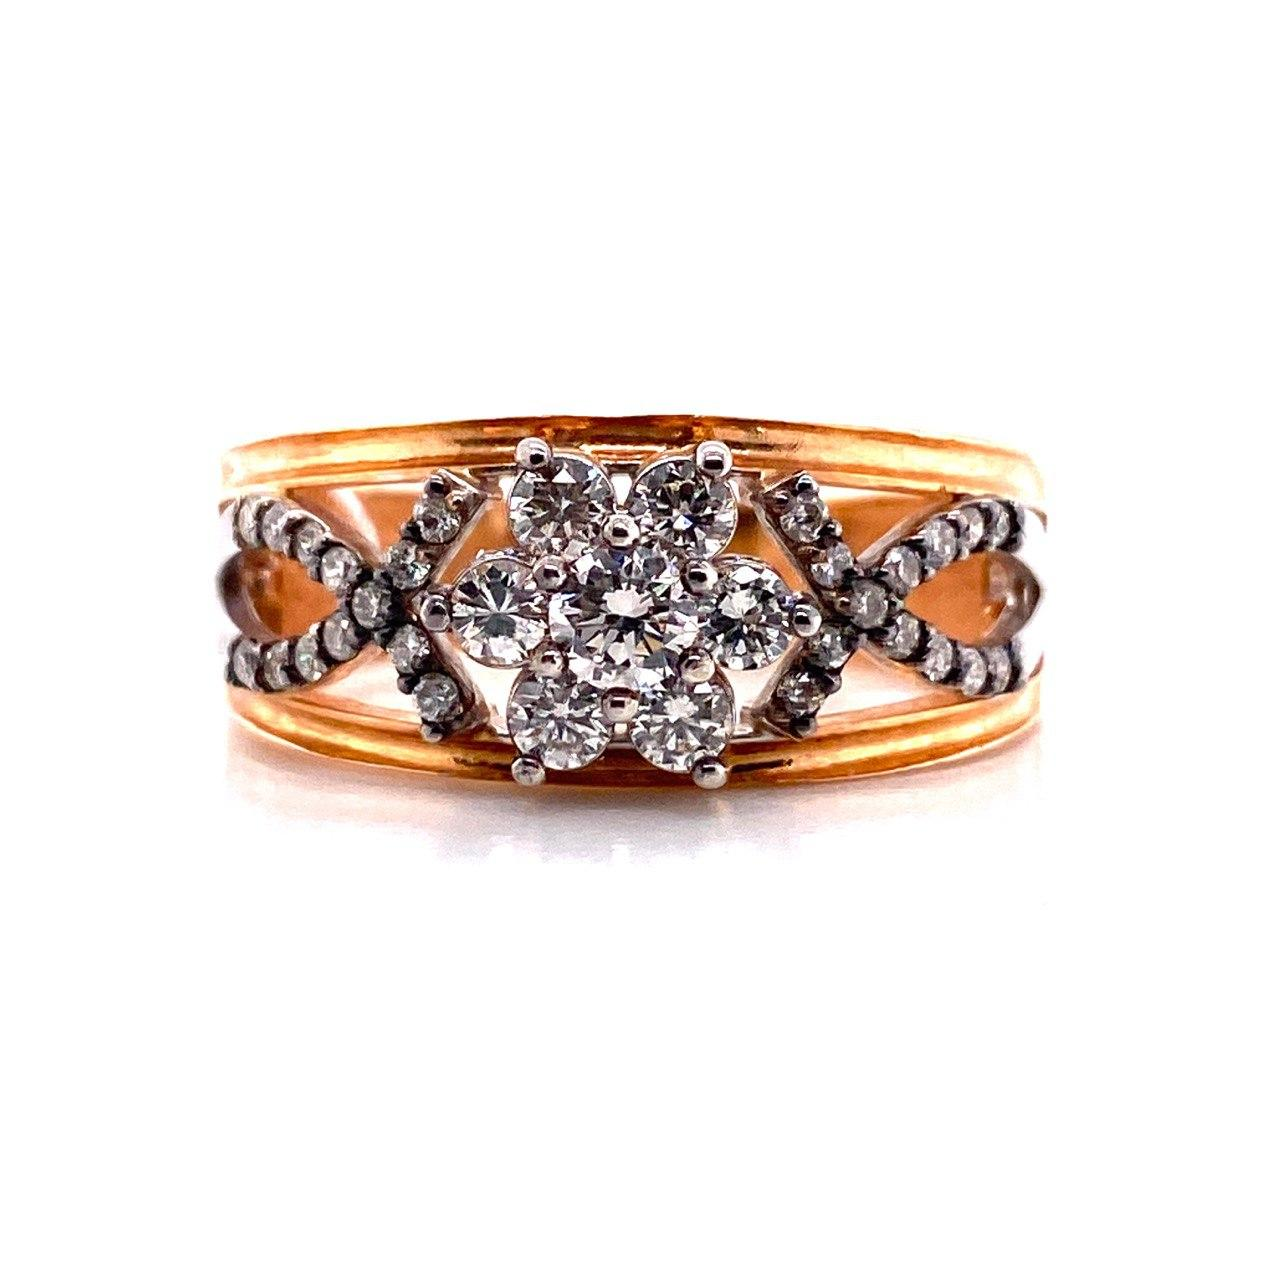 Кольцо из лимонного золота Бриллиант арт. 1122б 1122б